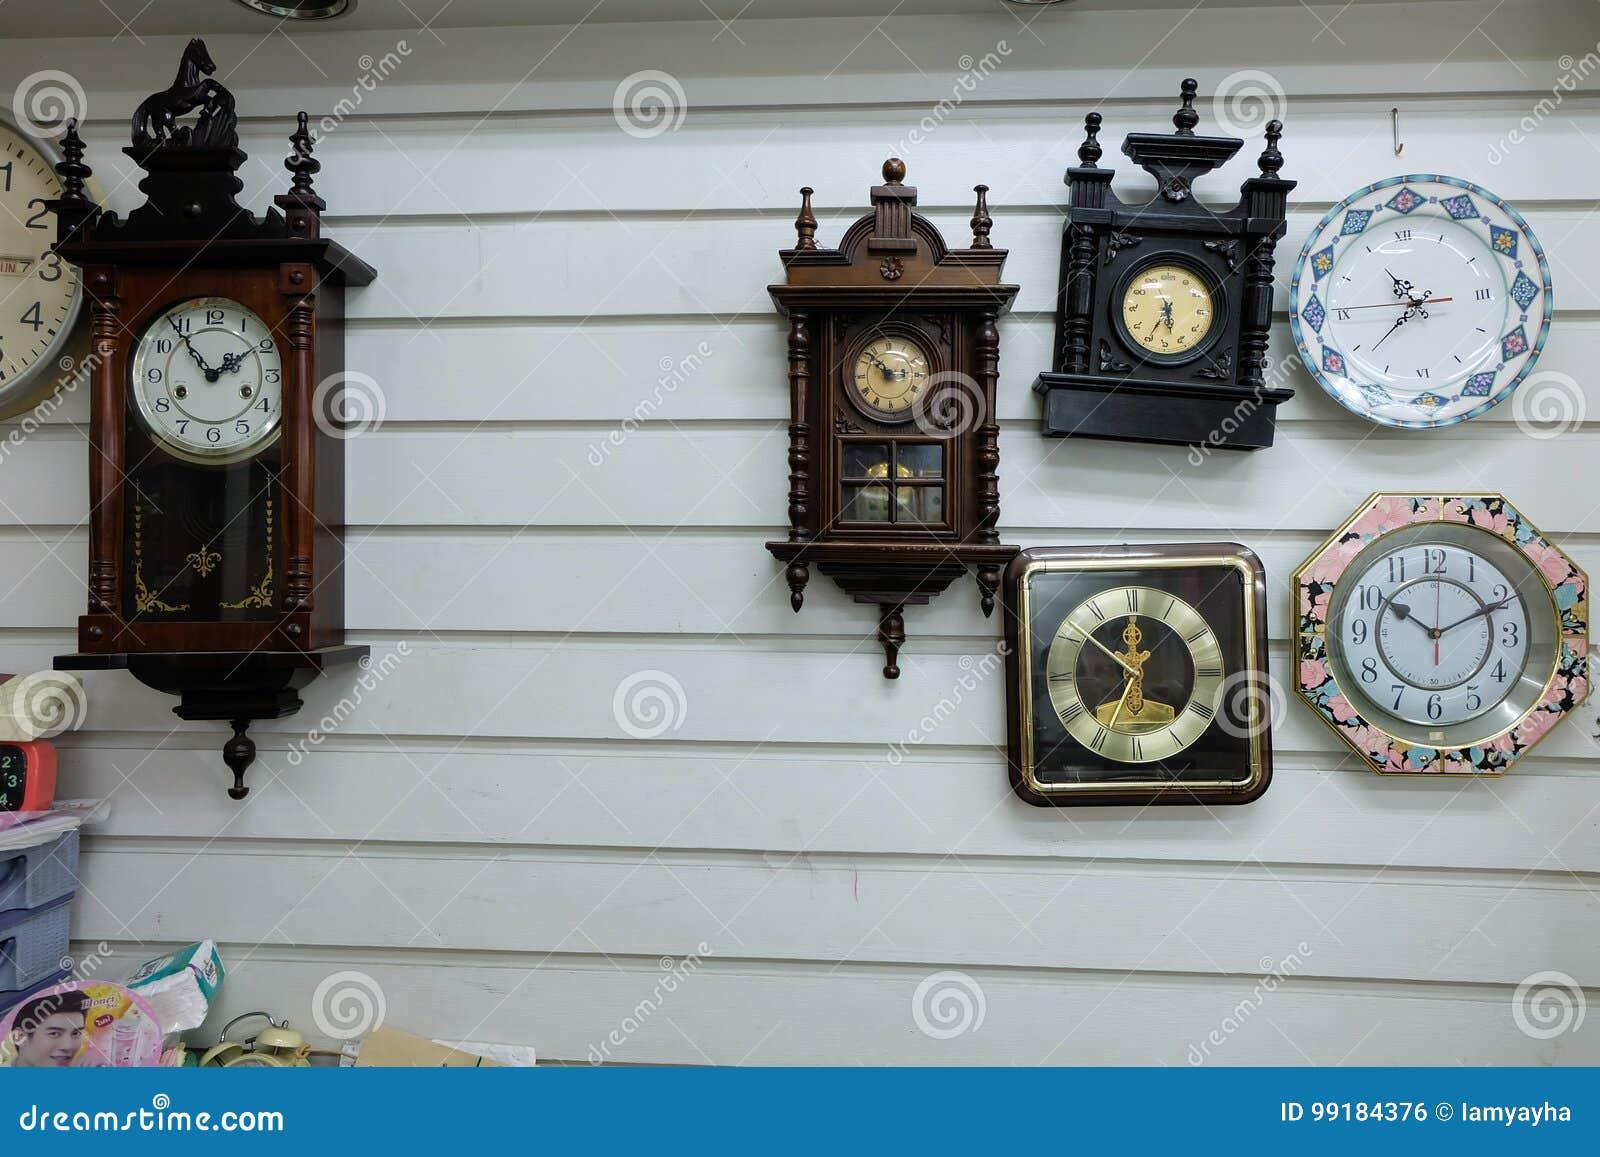 Vintage Clocks, Different Styles Old Clocks on Vintage Wall Background Background